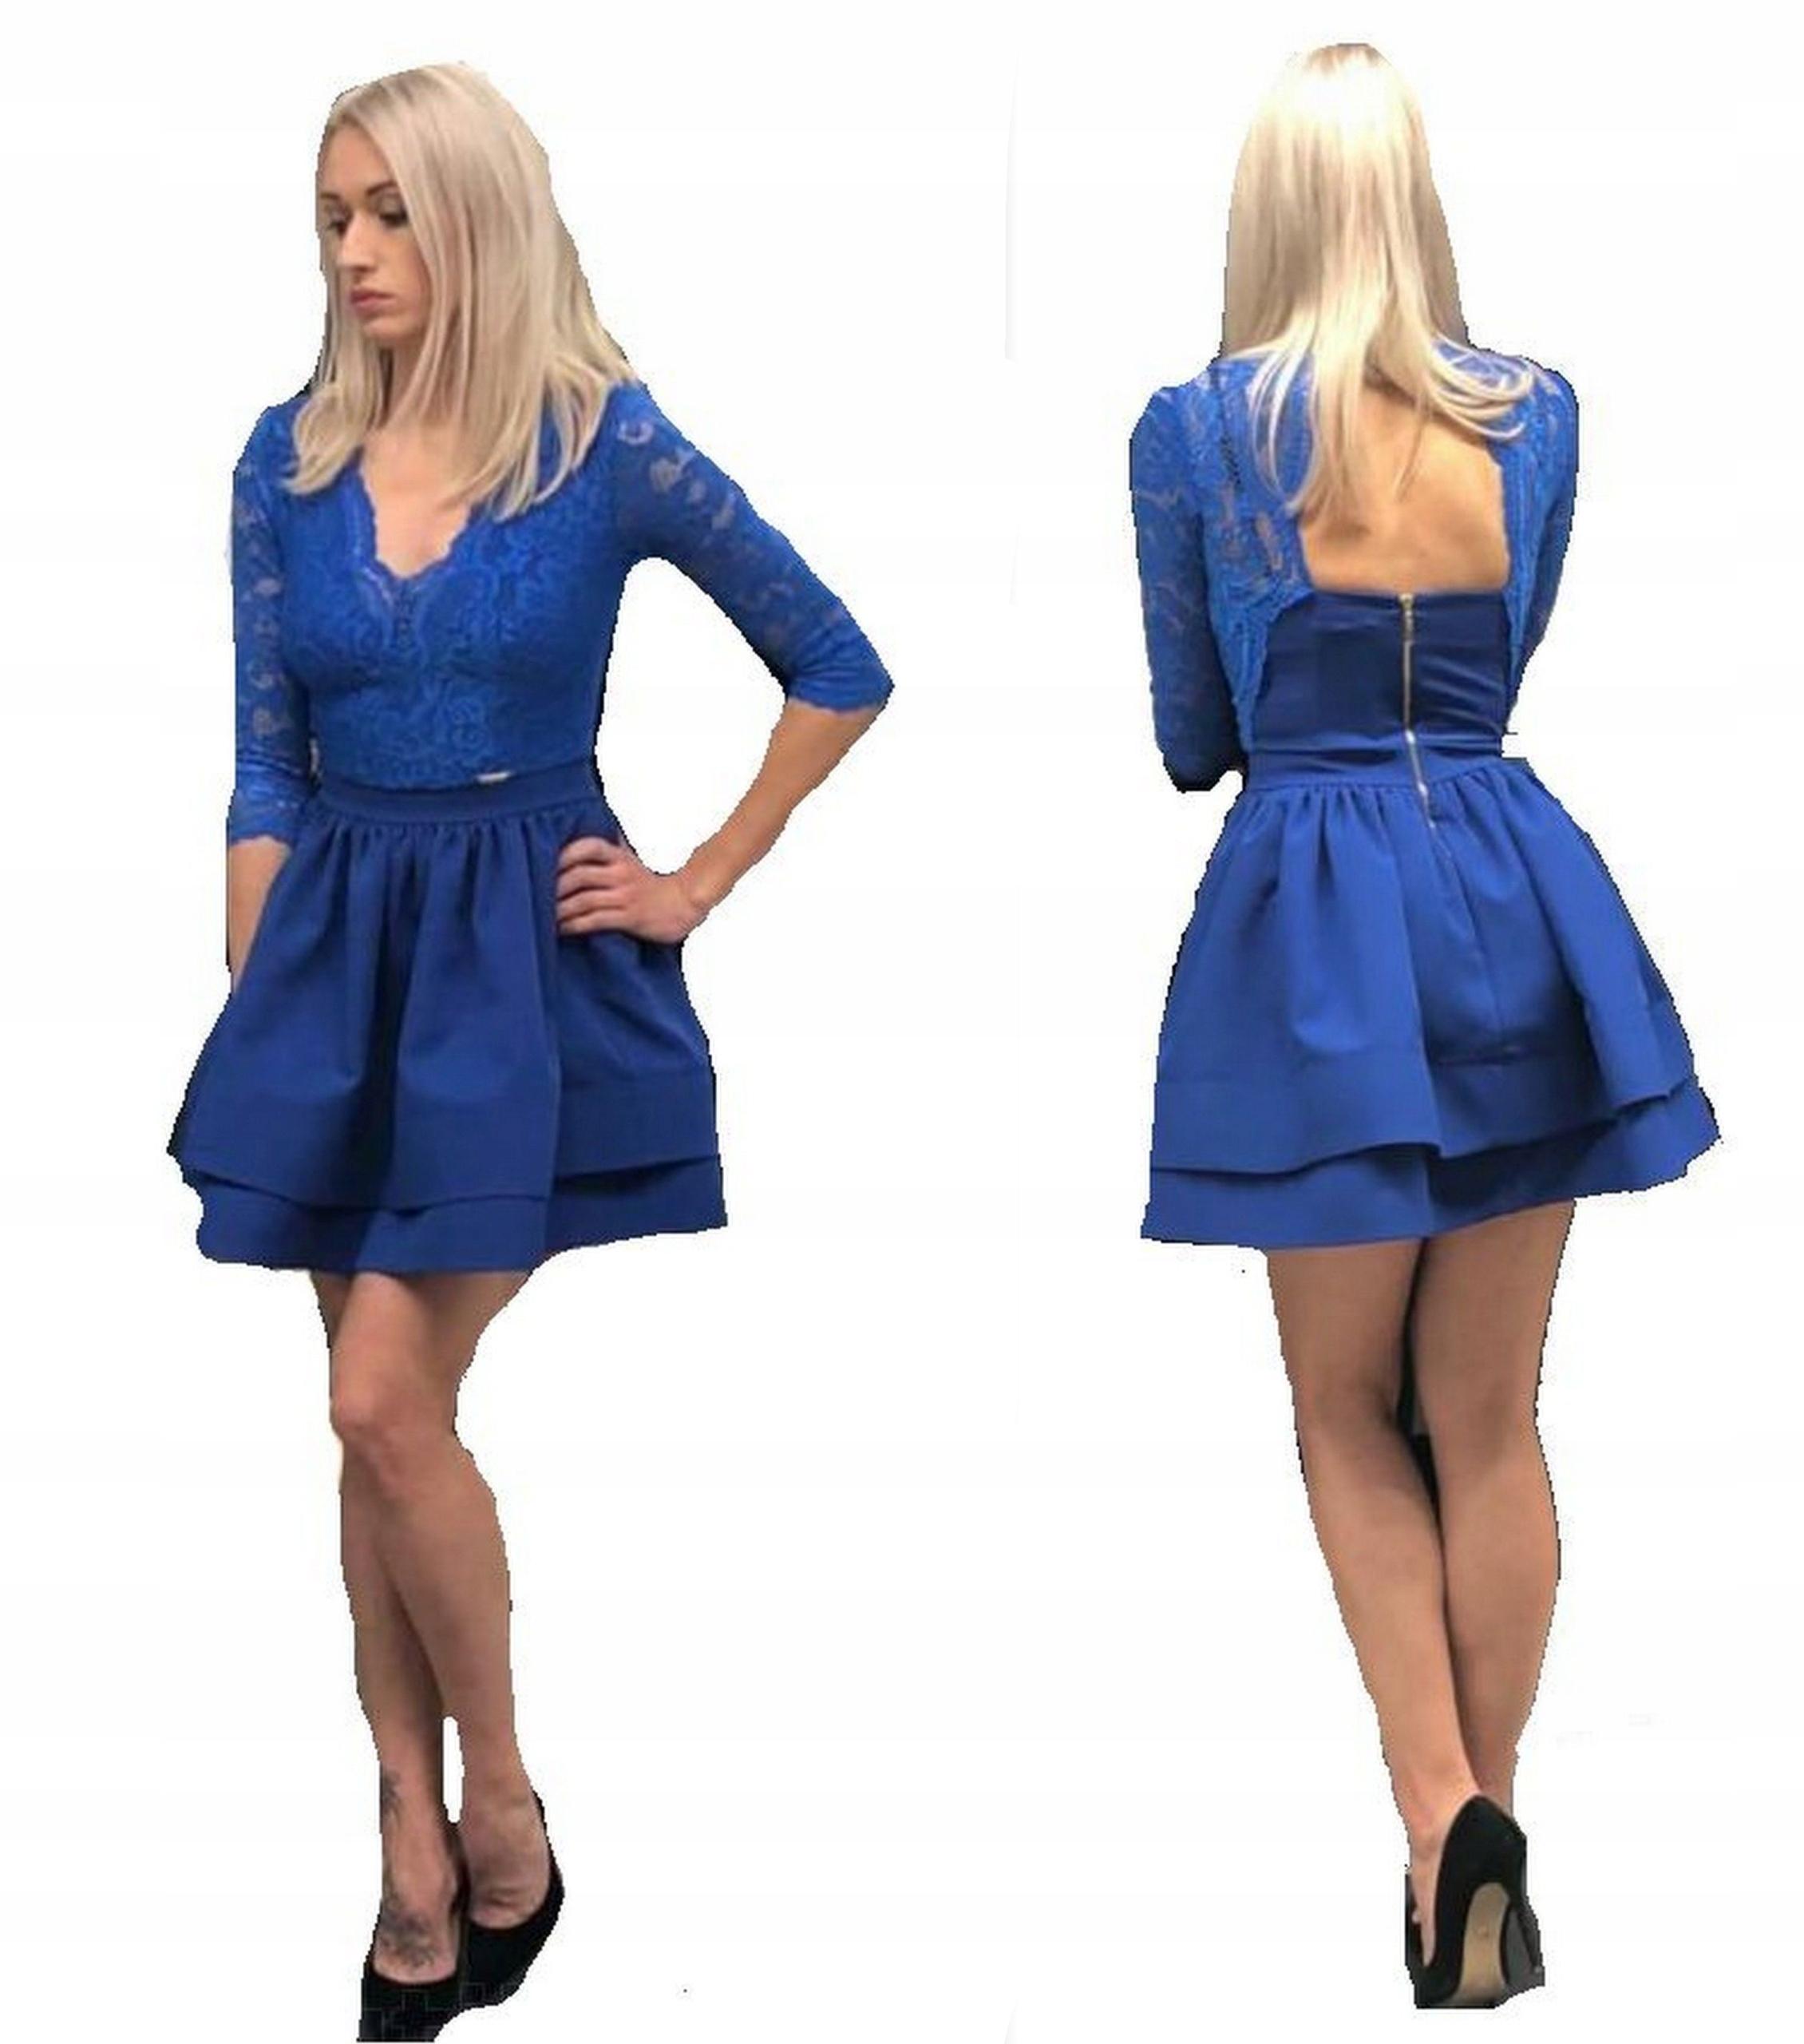 e757369e8a Chabrowa Sukienka S.MORISS Glamour r.S - 7063901267 - oficjalne ...